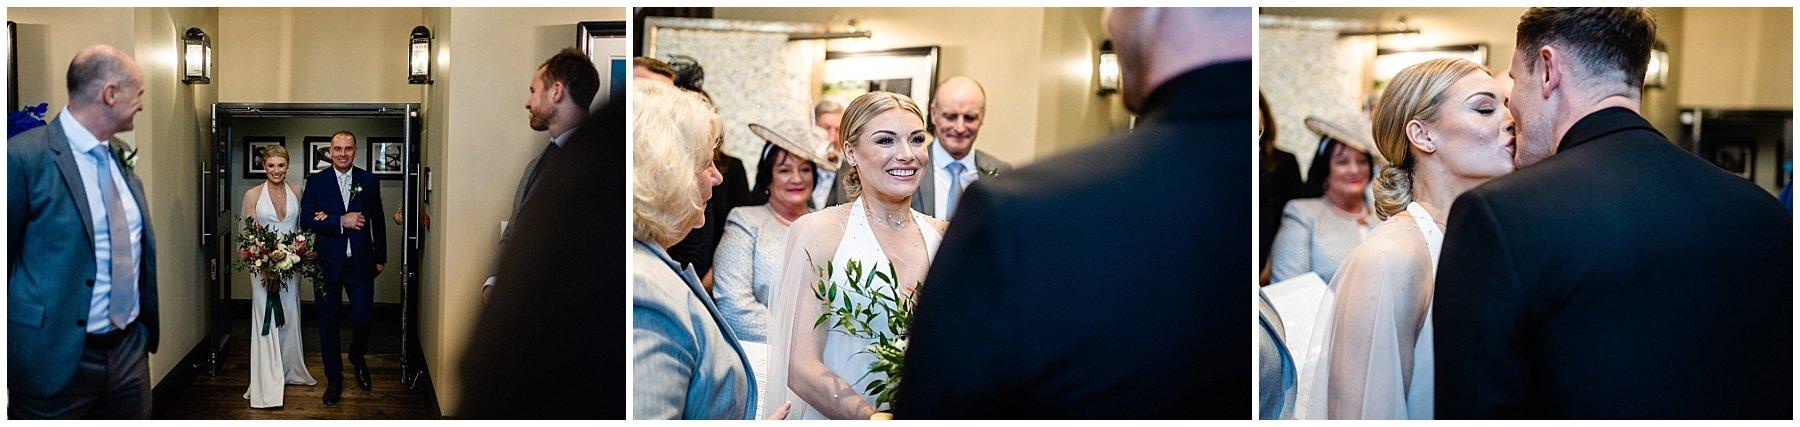 Hotel Du Vin Wedding | Newcastle Wedding photographers | wedding ceremony